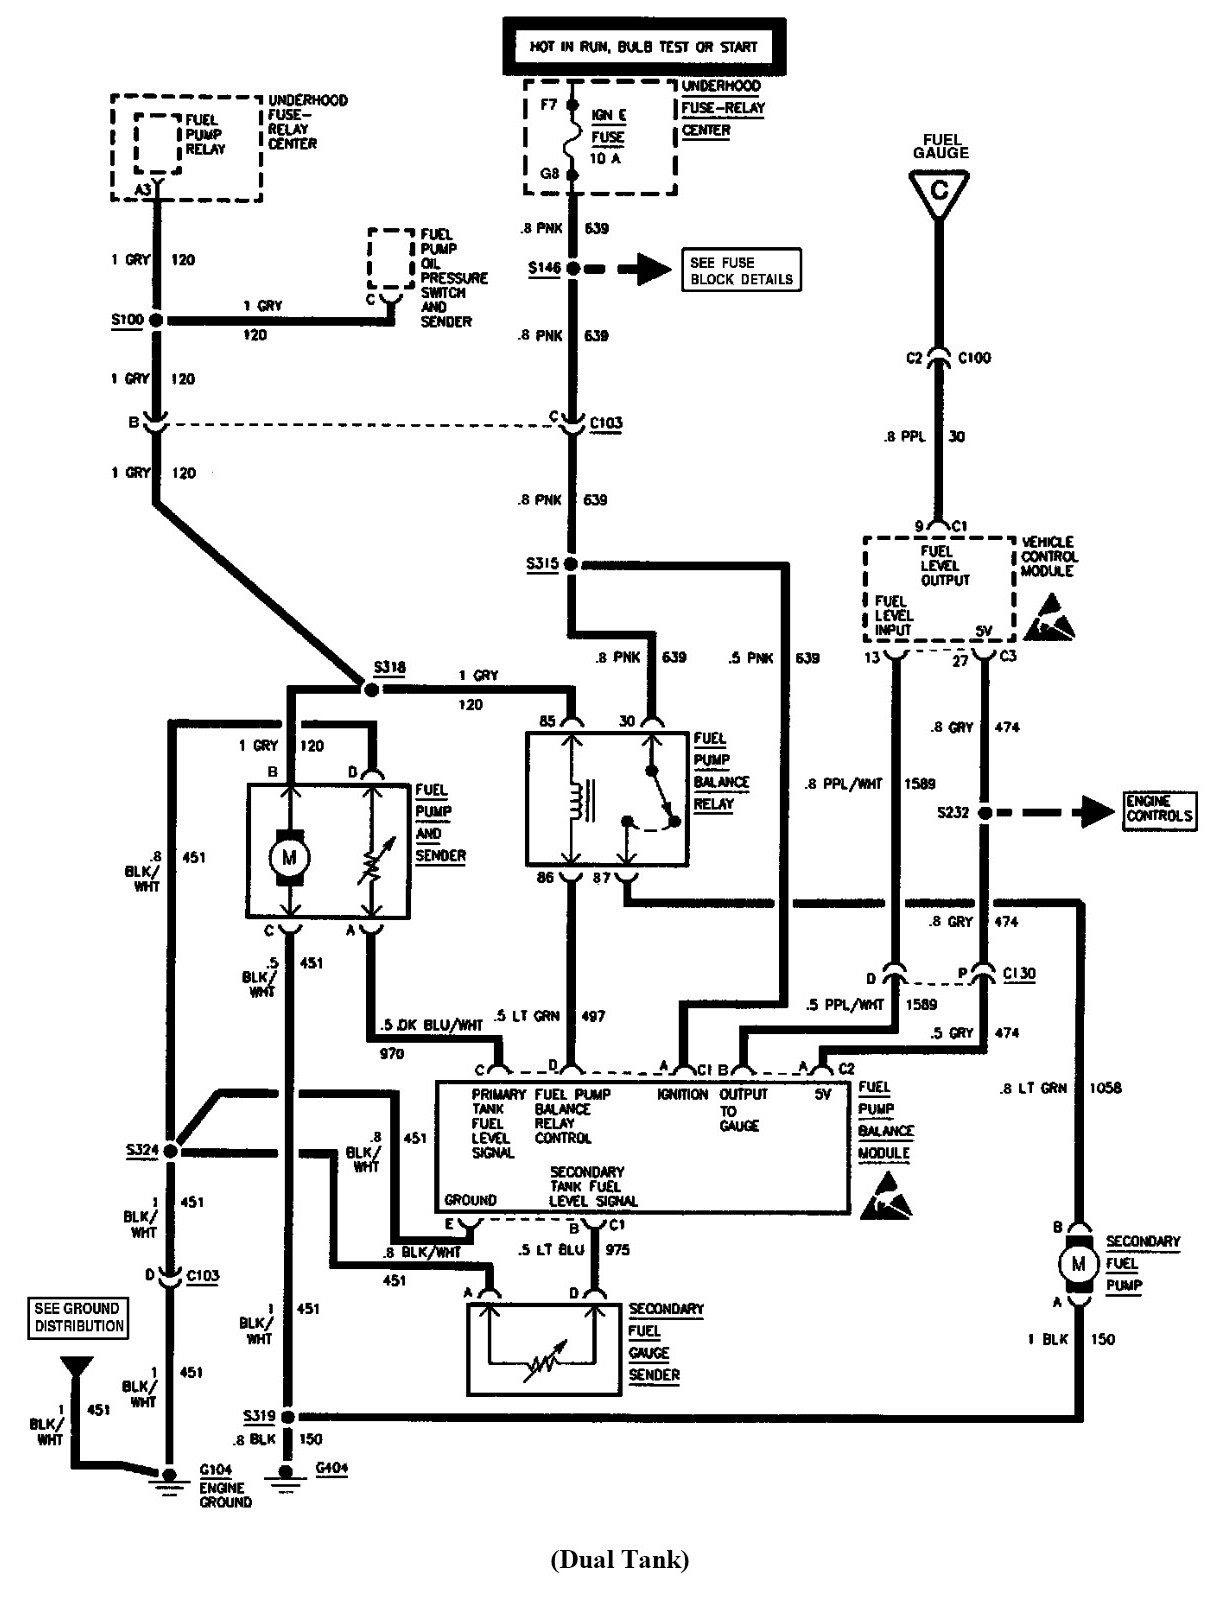 Whereis the fuel pump relay on my 1998 GMC sierra 4WD?